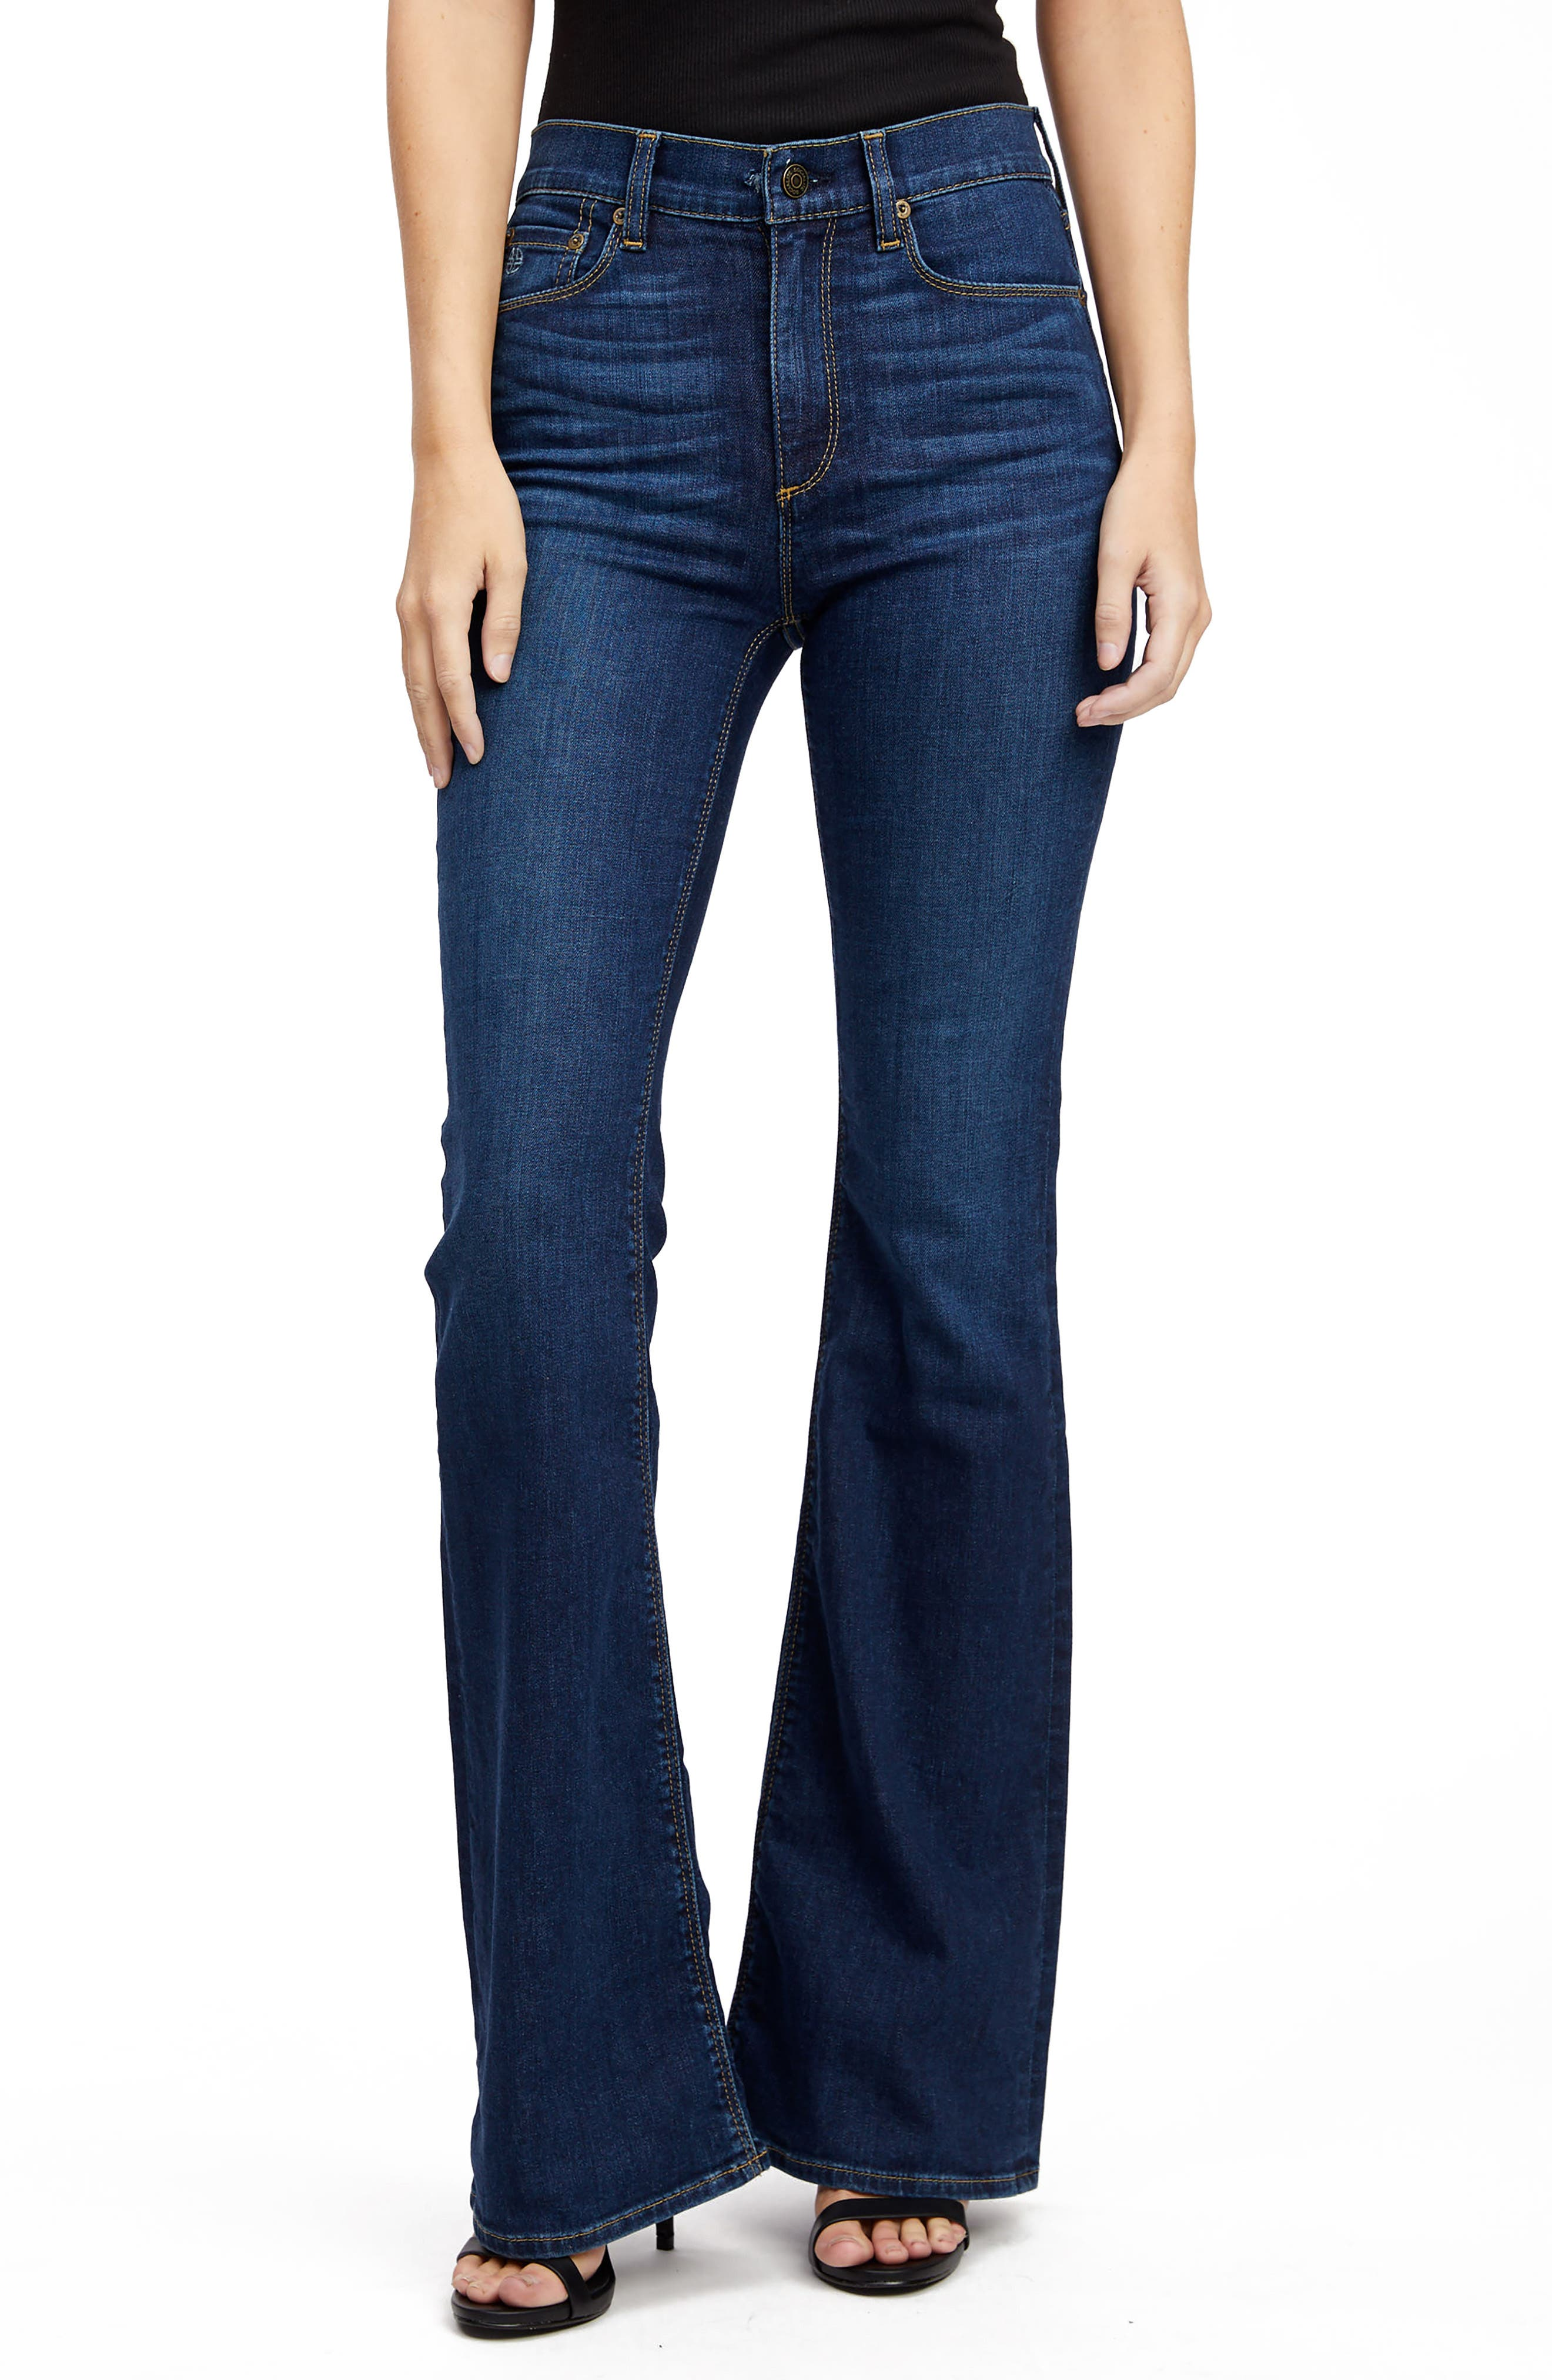 Vintage High Waisted Trousers, Sailor Pants, Jeans Womens Socialite Remi High Waist Flare Jeans $138.00 AT vintagedancer.com